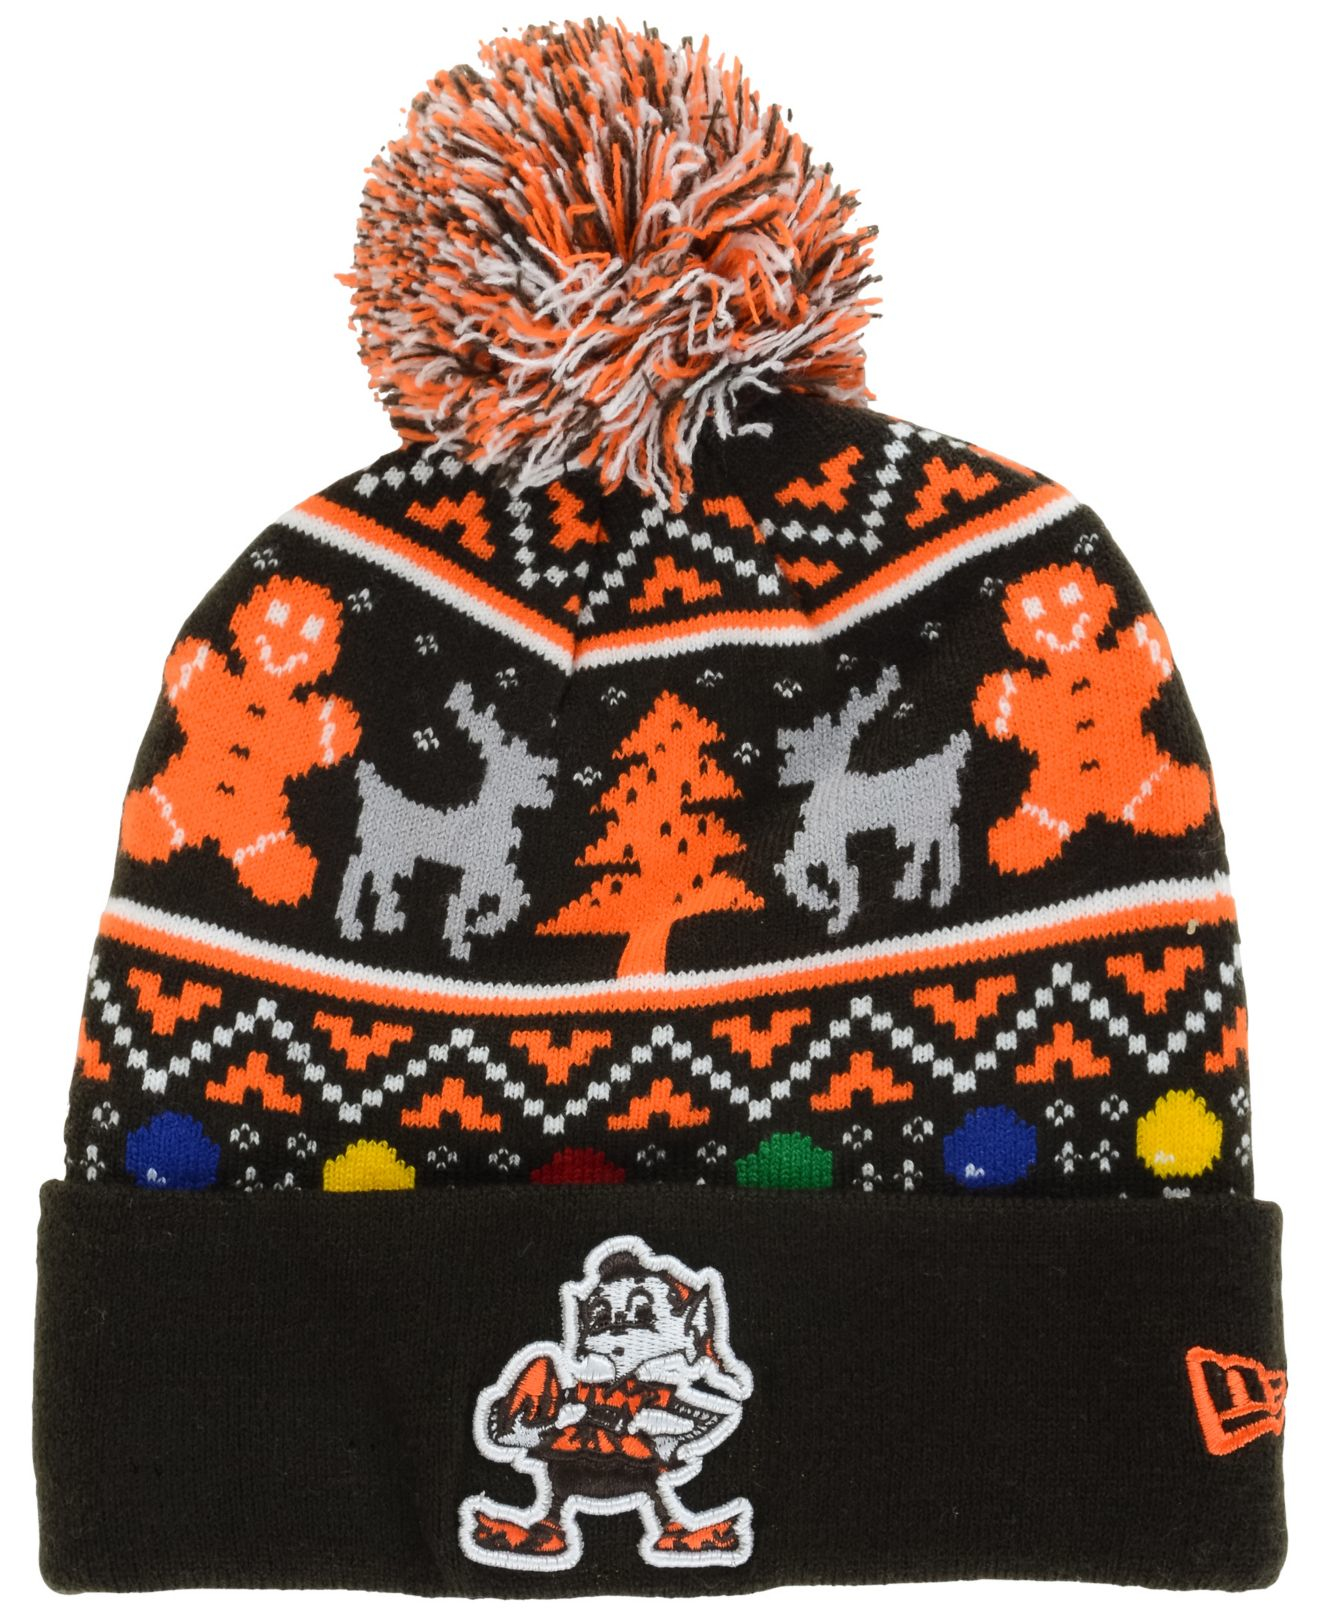 Cleveland Browns Christmas Sweater.Ktz Multicolor Cleveland Browns Christmas Sweater Pom Knit Hat For Men